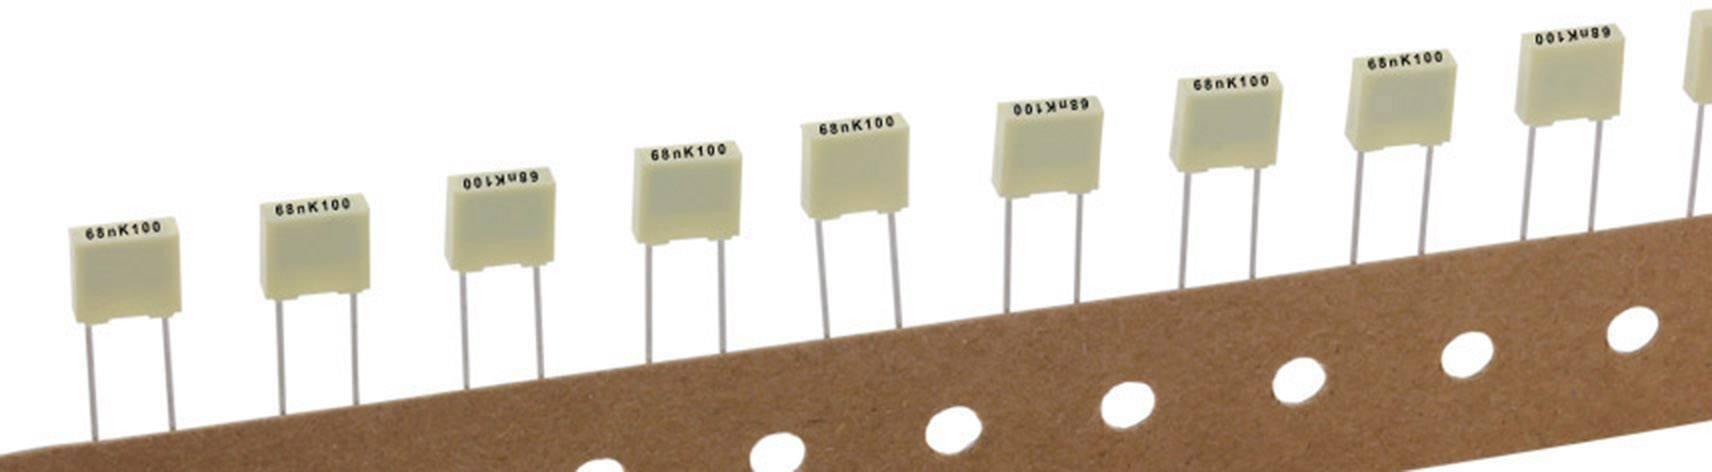 Polyesterový kondenzátor Kemet R82EC2220DQ50K+ radiálne vývody, 22 nF, 100 V,10 %, 5 mm, (d x š x v) 7.2 x 2.5 mm x 6.5 mm, 1 ks